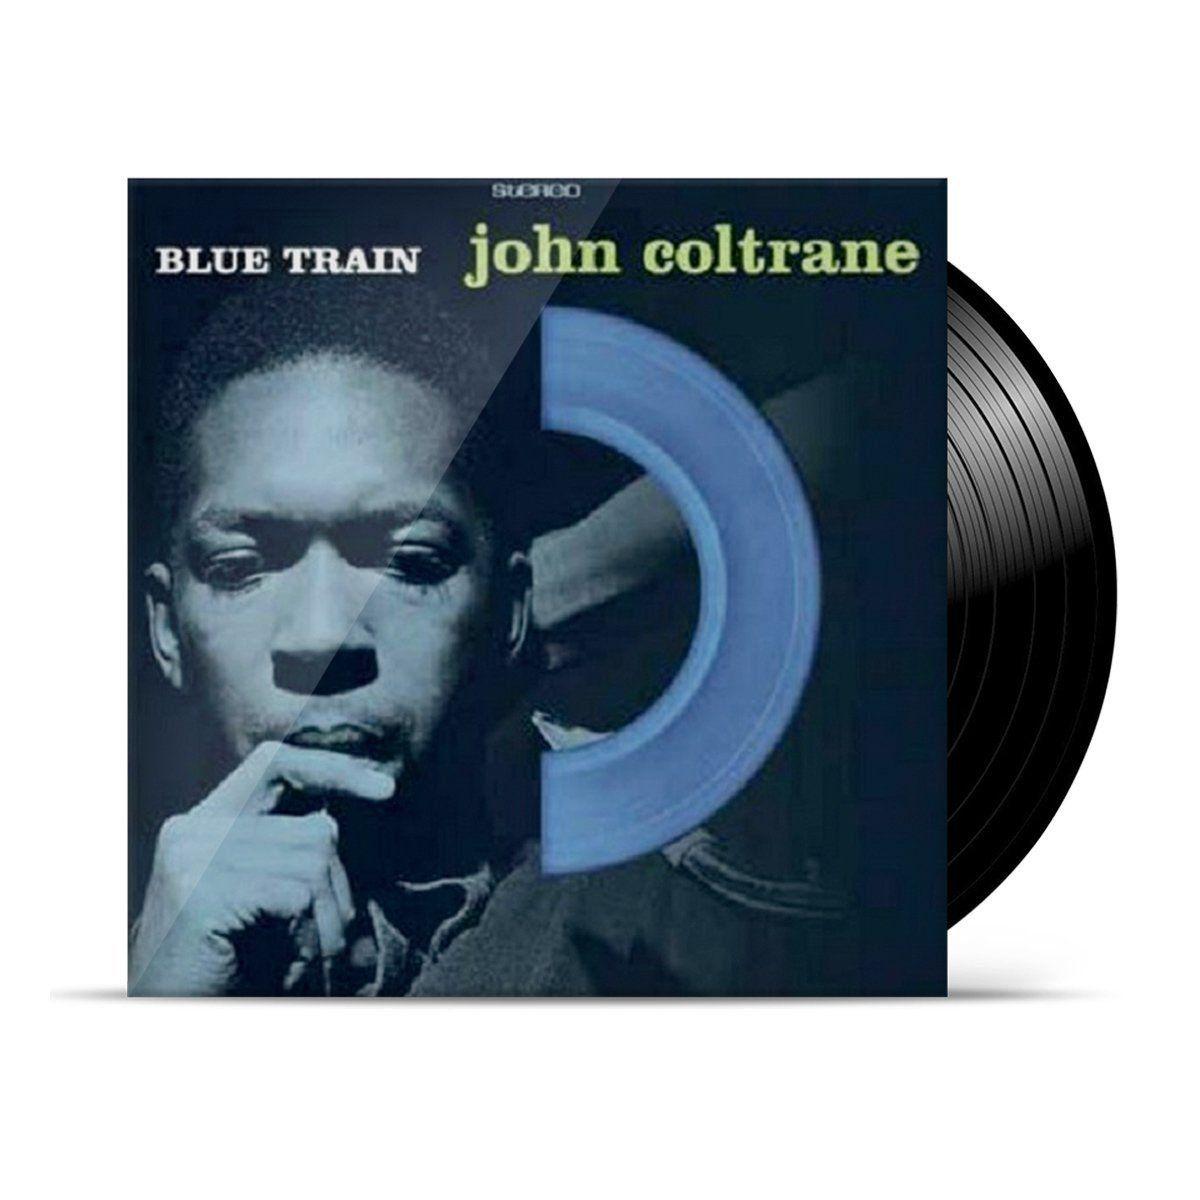 LP John Coltrane Blue Train  - bandUP Store Marketplace